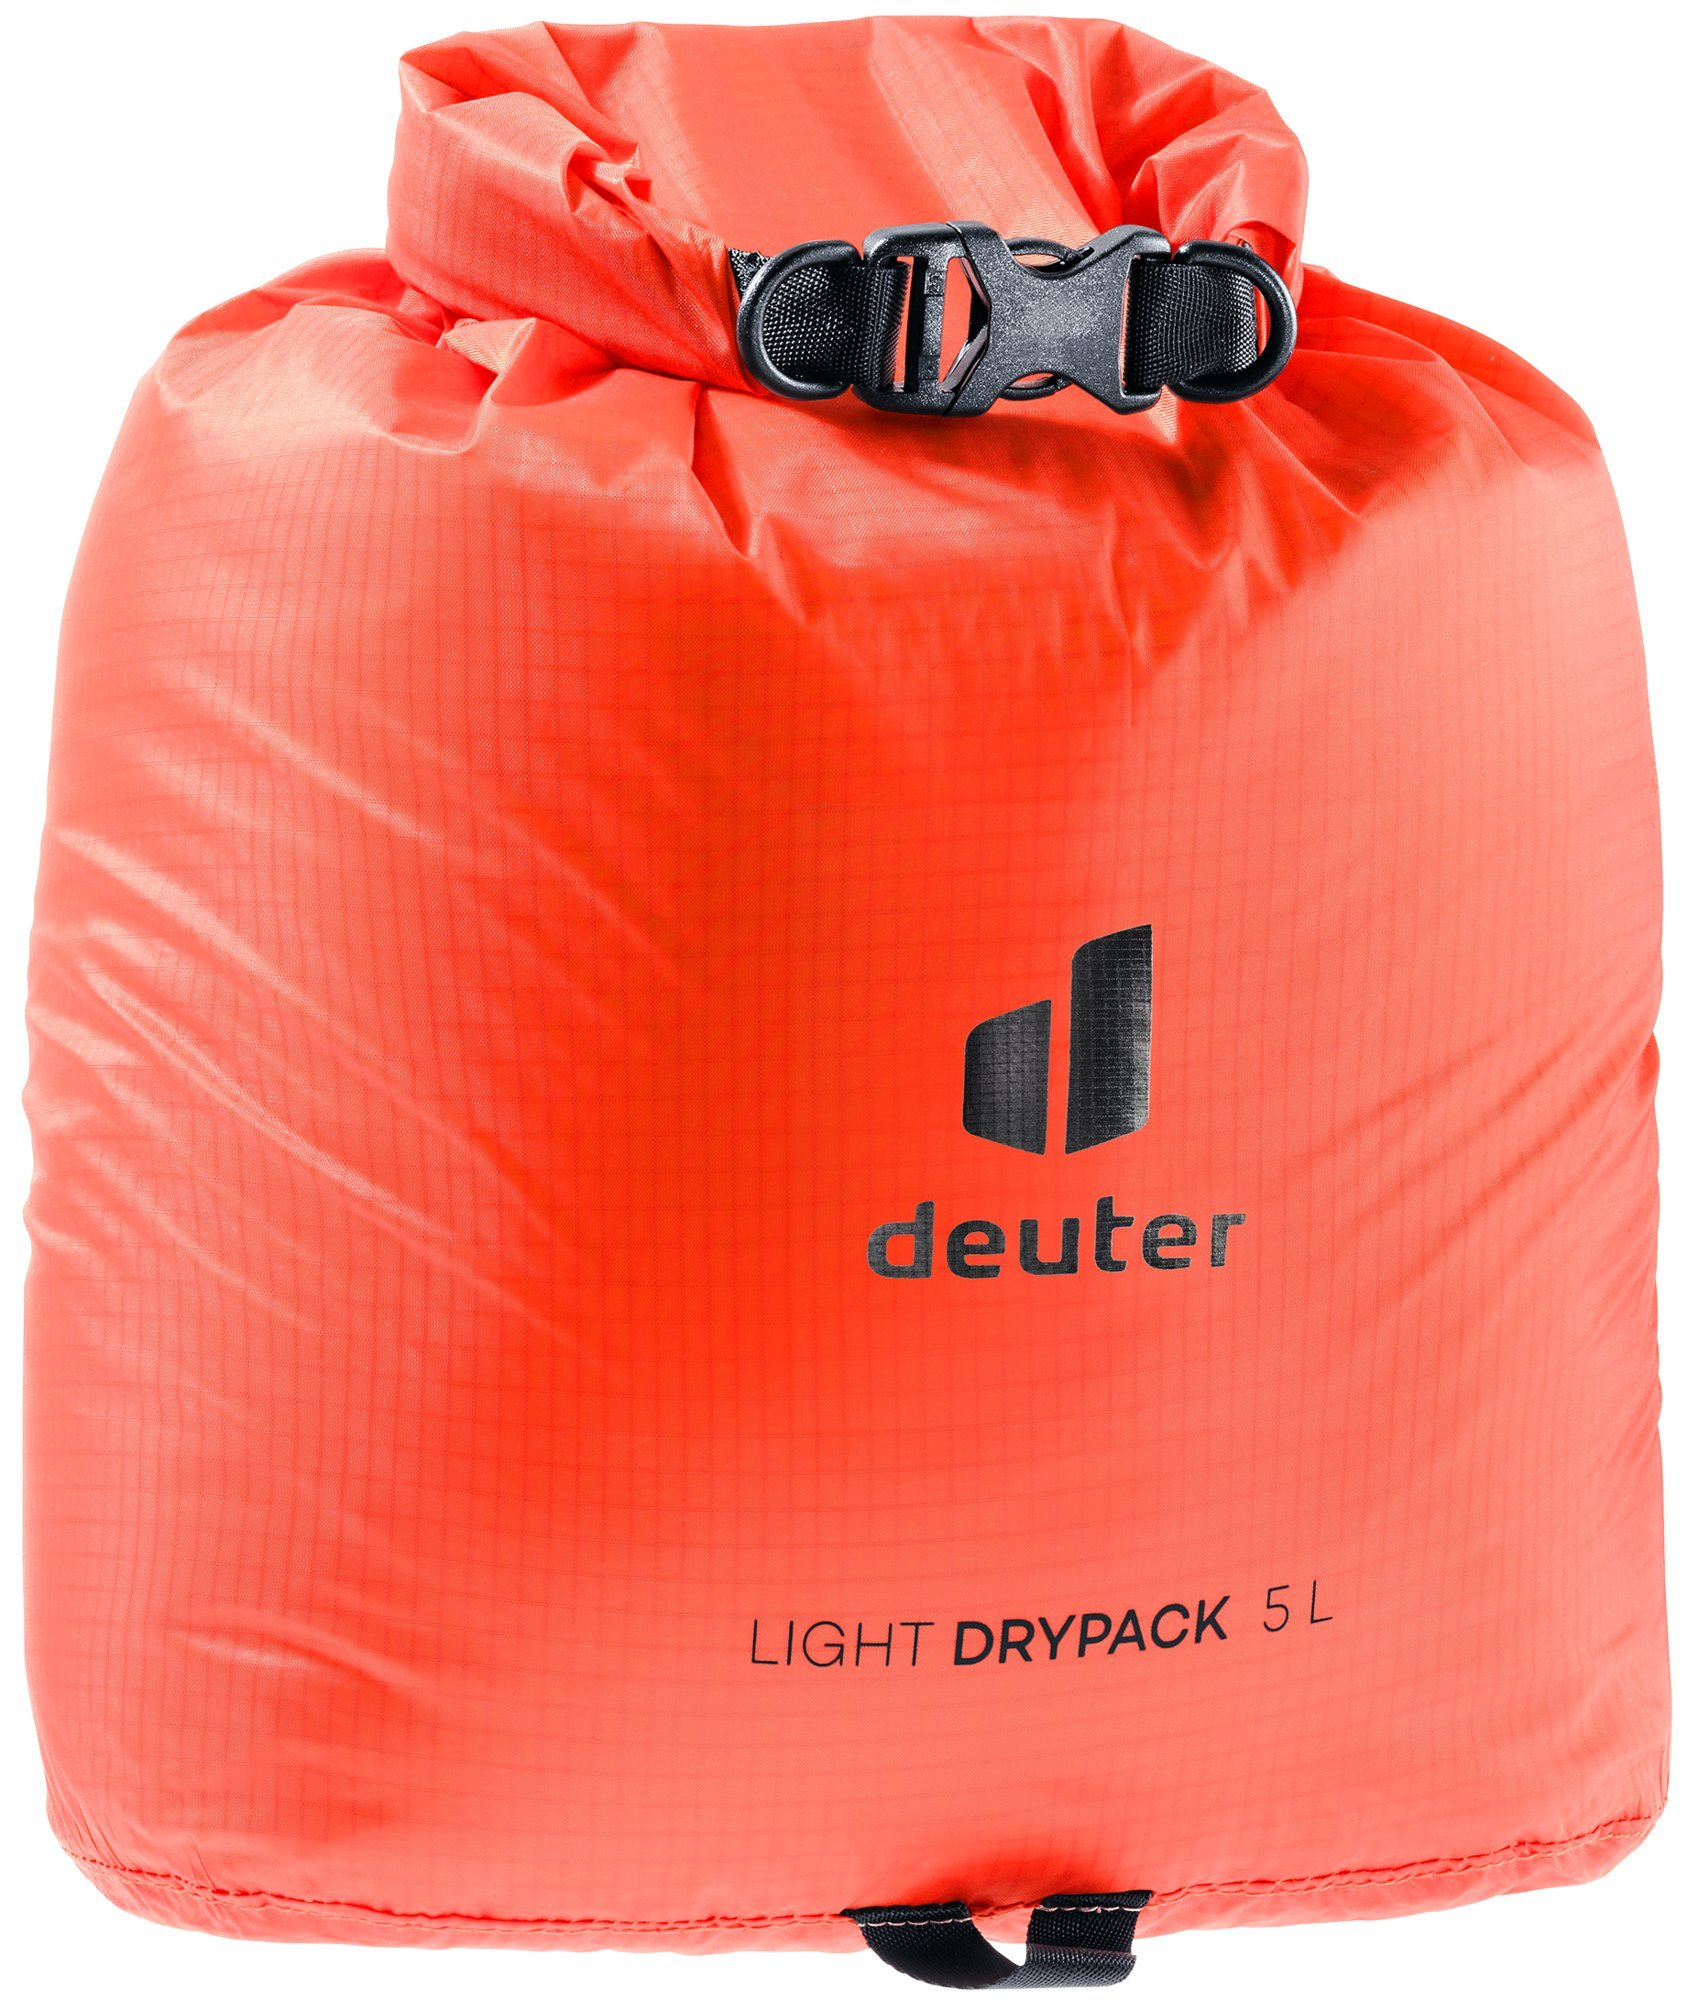 Новинки Гермомешок Deuter Light Drypack 5 (2021) 3940121-9002-LightDrypack5-w20-d0.jpg